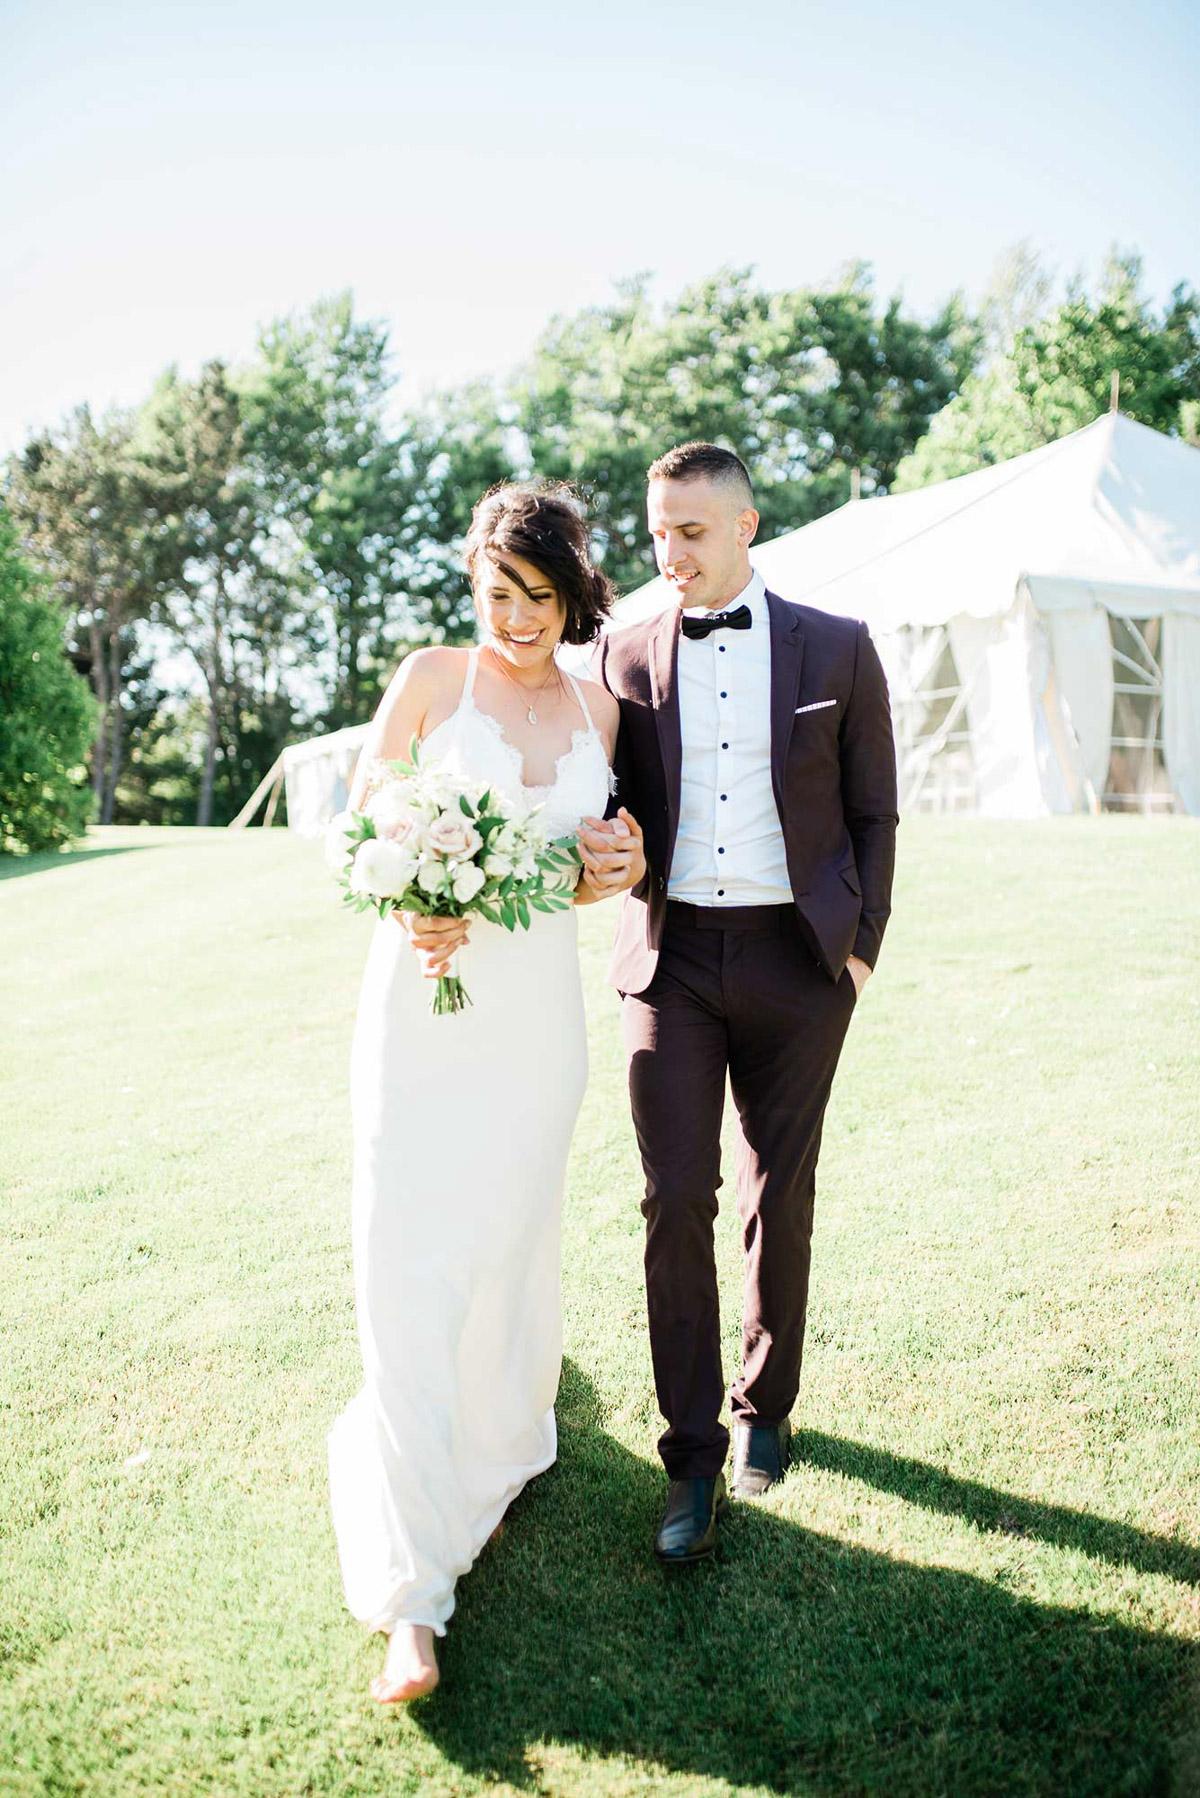 destiny-dawn-photography-vineyard-bride-swish-list-knollwood-golf-and-country-club-ancaster-wedding-editorial-17.jpg